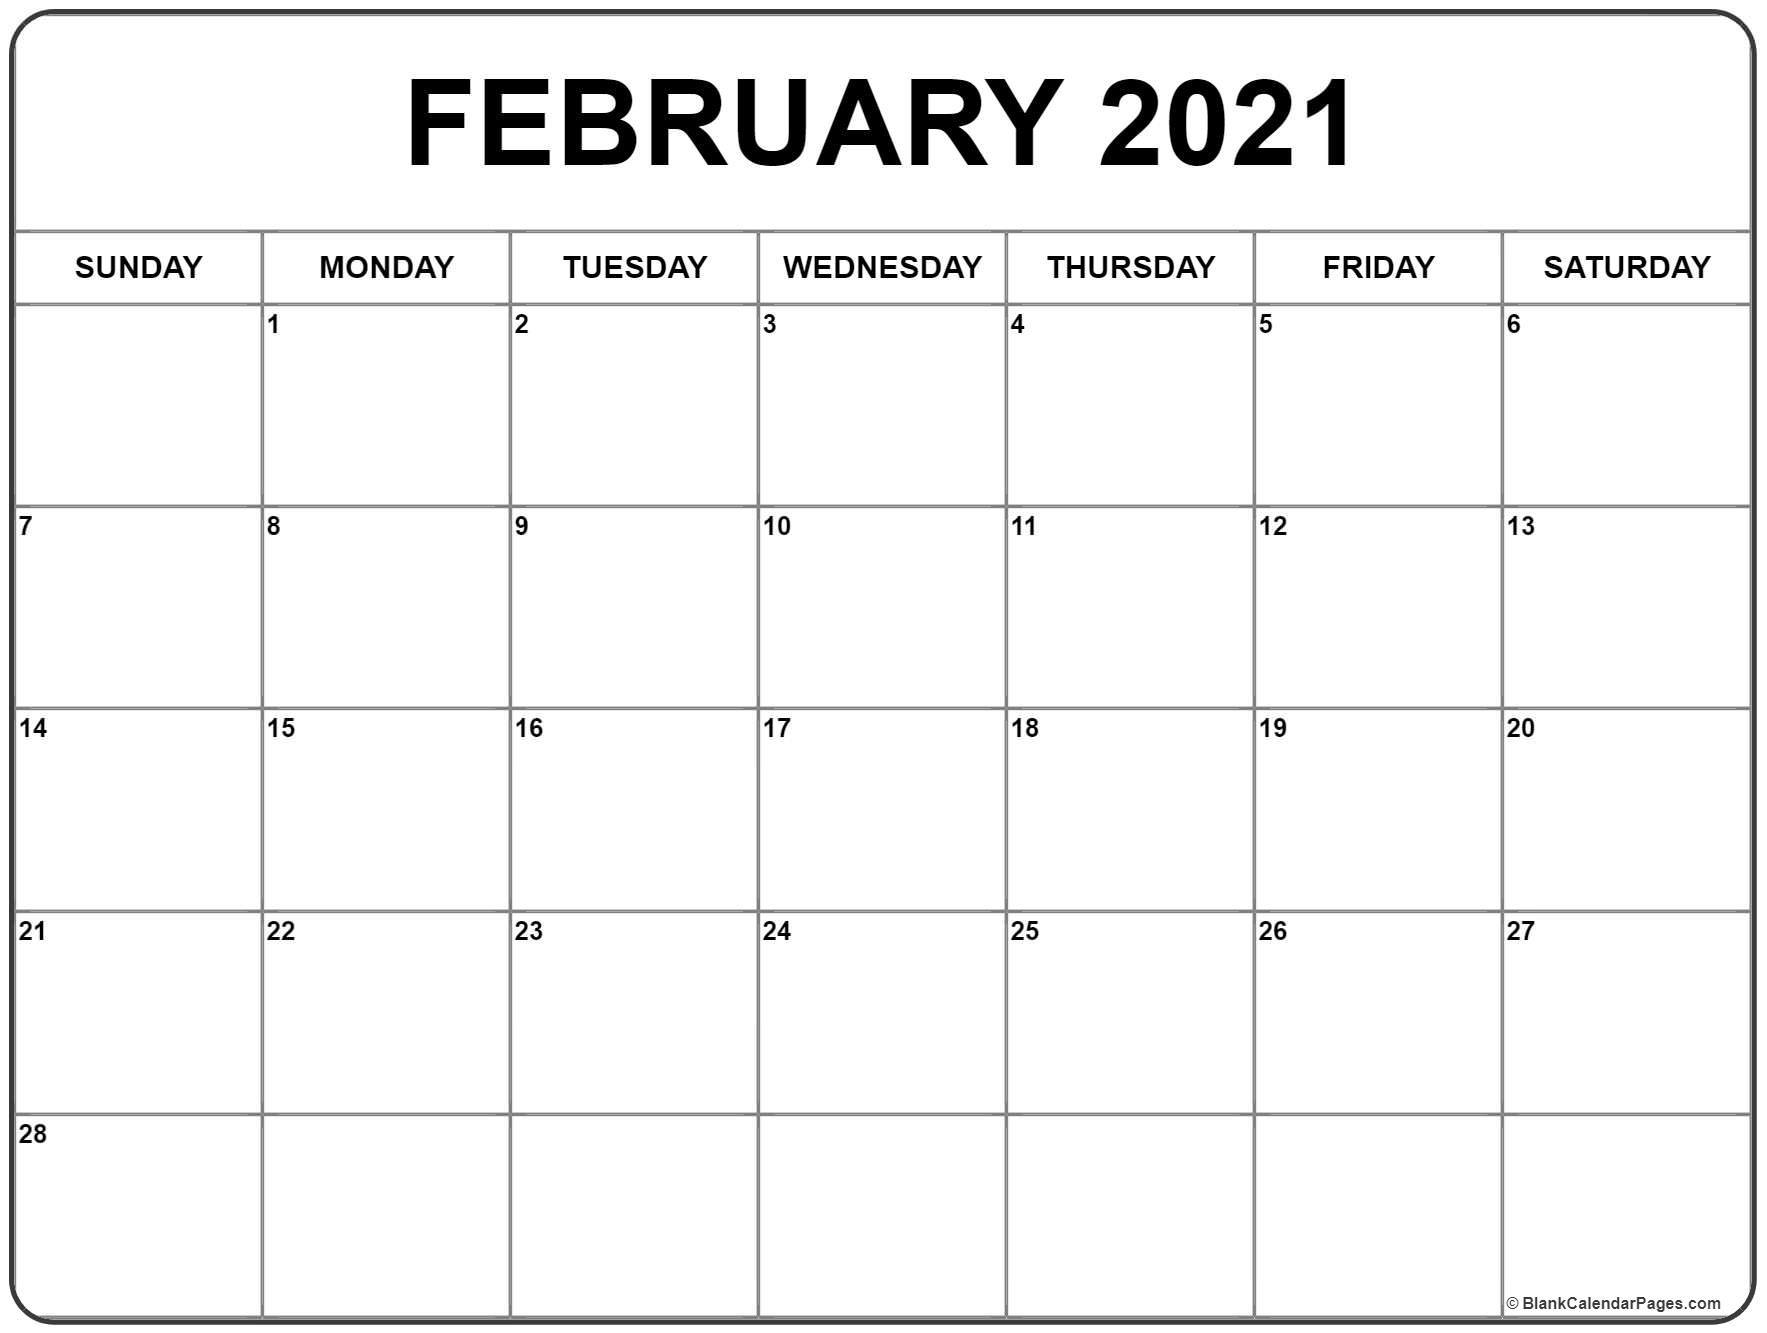 February 2021 Calendar | Free Printable Monthly Calendars  2021 Calendar Printable